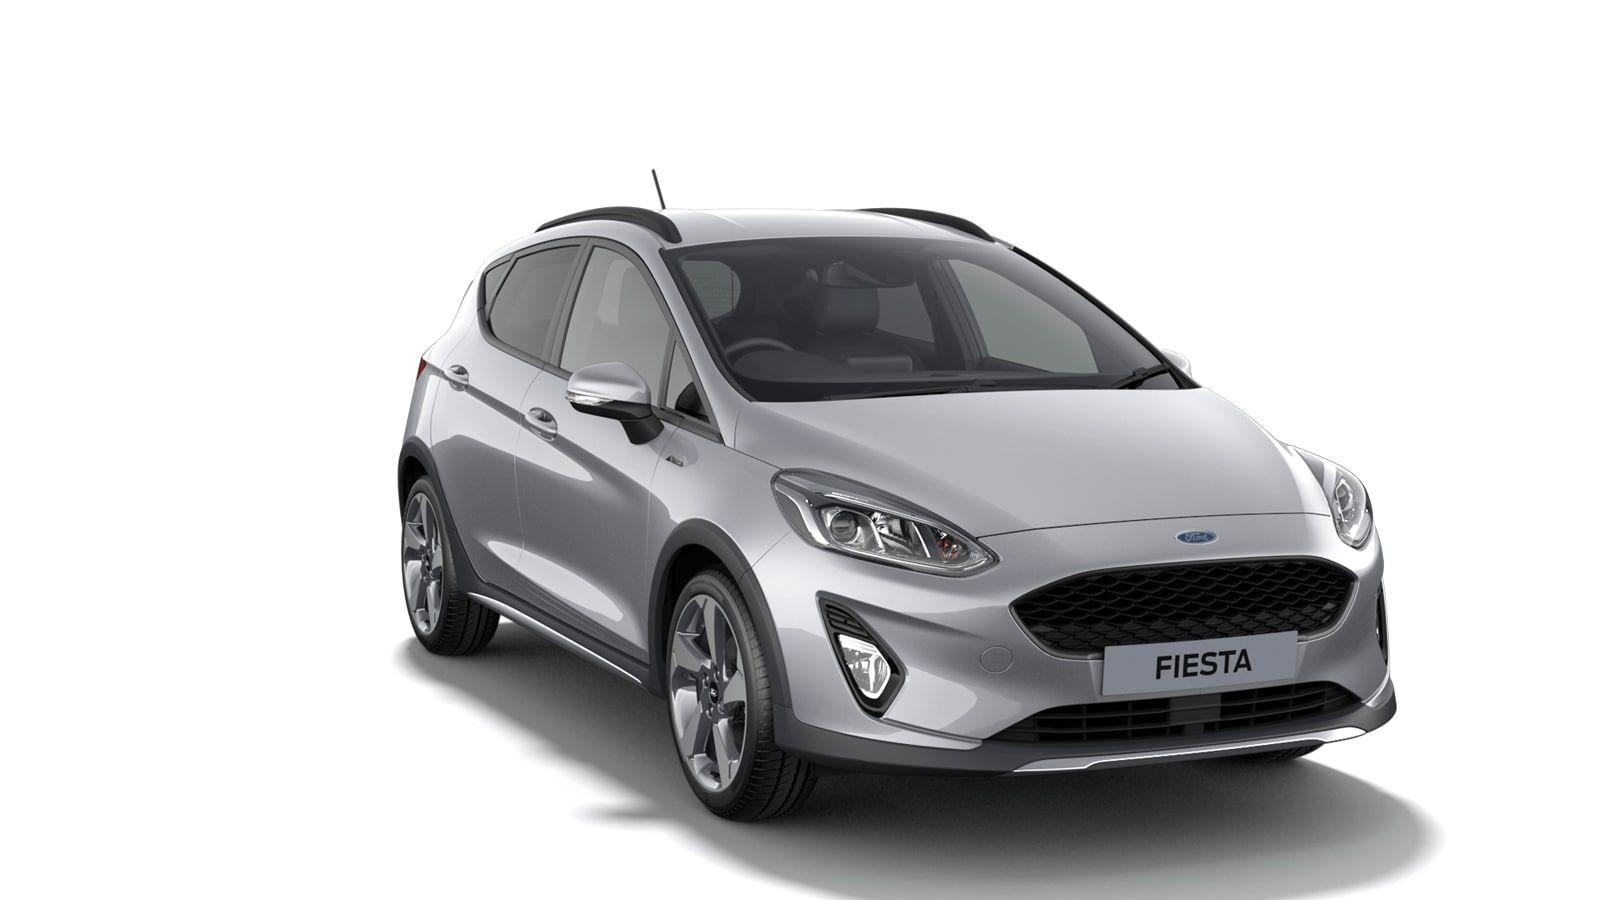 "Nieuw Ford All-new ford fiesta Active 1.0i EcoBoost mHEV 125ps / 92kW M6 - 5d JK6 - Metaalkleur ""Moondust Silver"" 2"